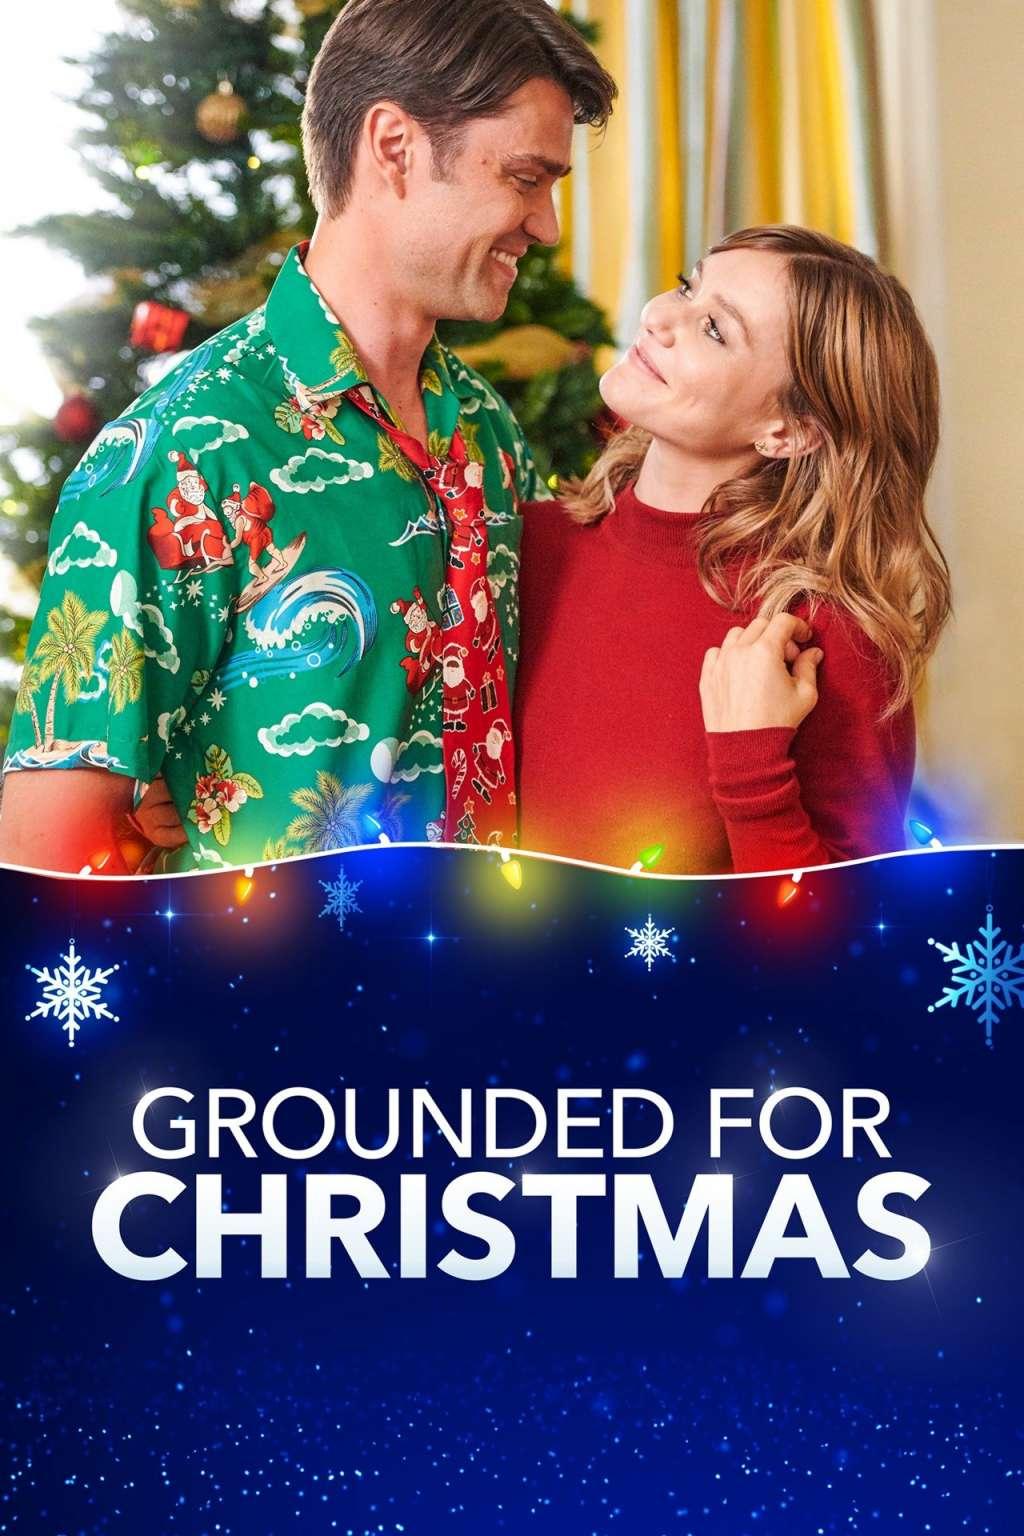 Grounded for Christmas kapak